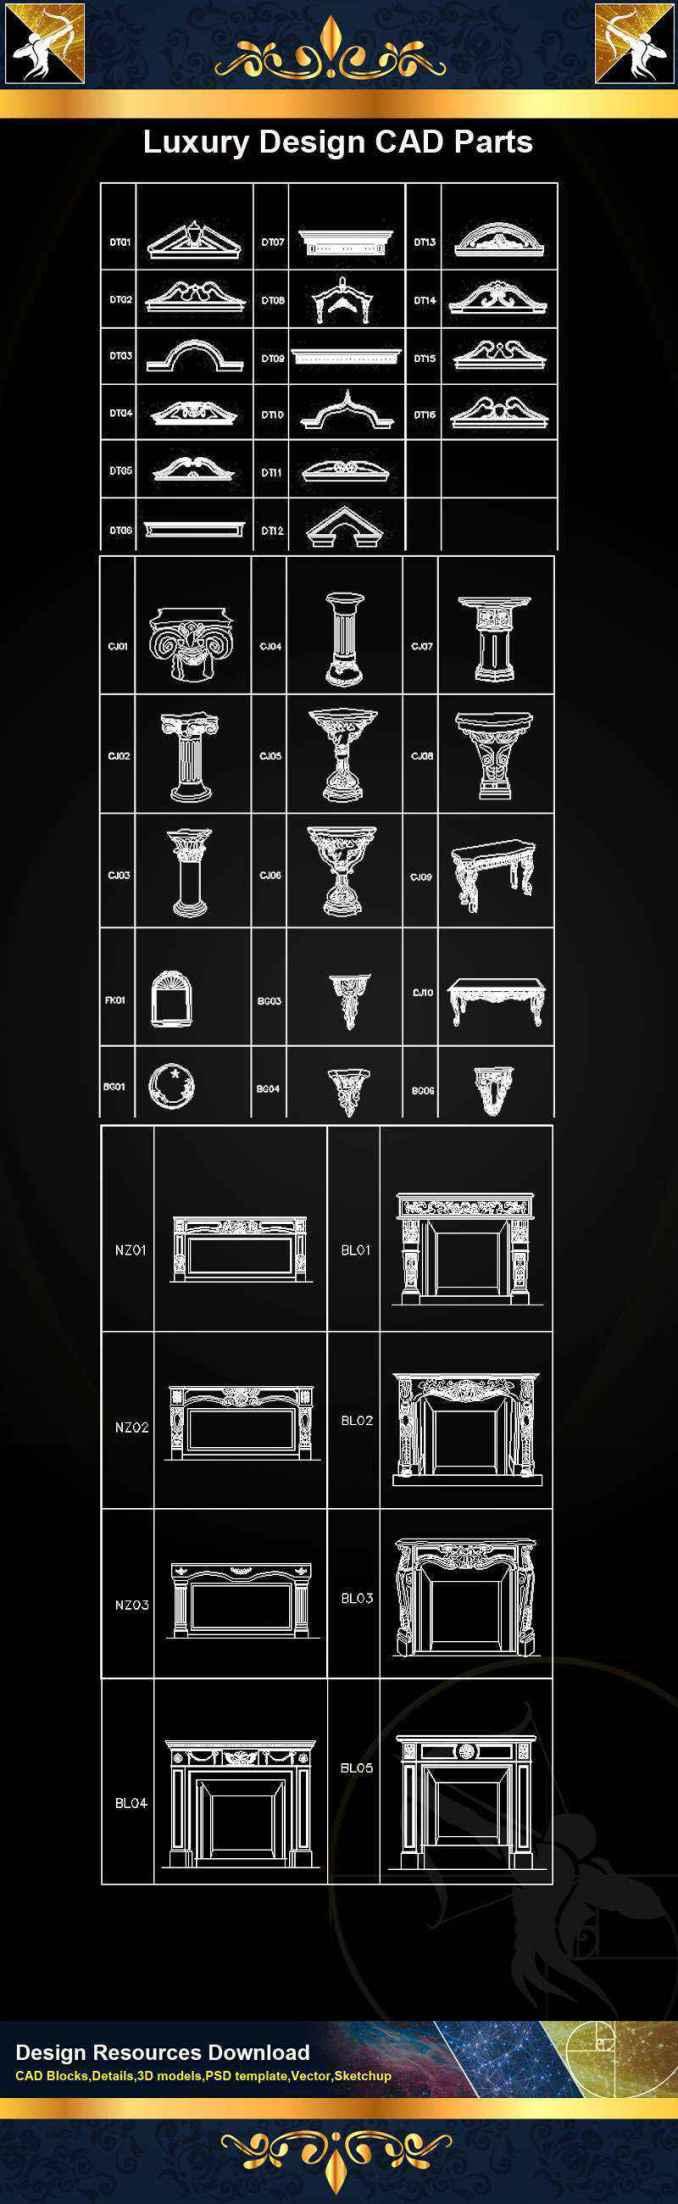 ★【Architecture Decoration Design Element CAD Blocks V 6】@Autocad Decoration  Blocks,Drawings,CAD Details,Elevation